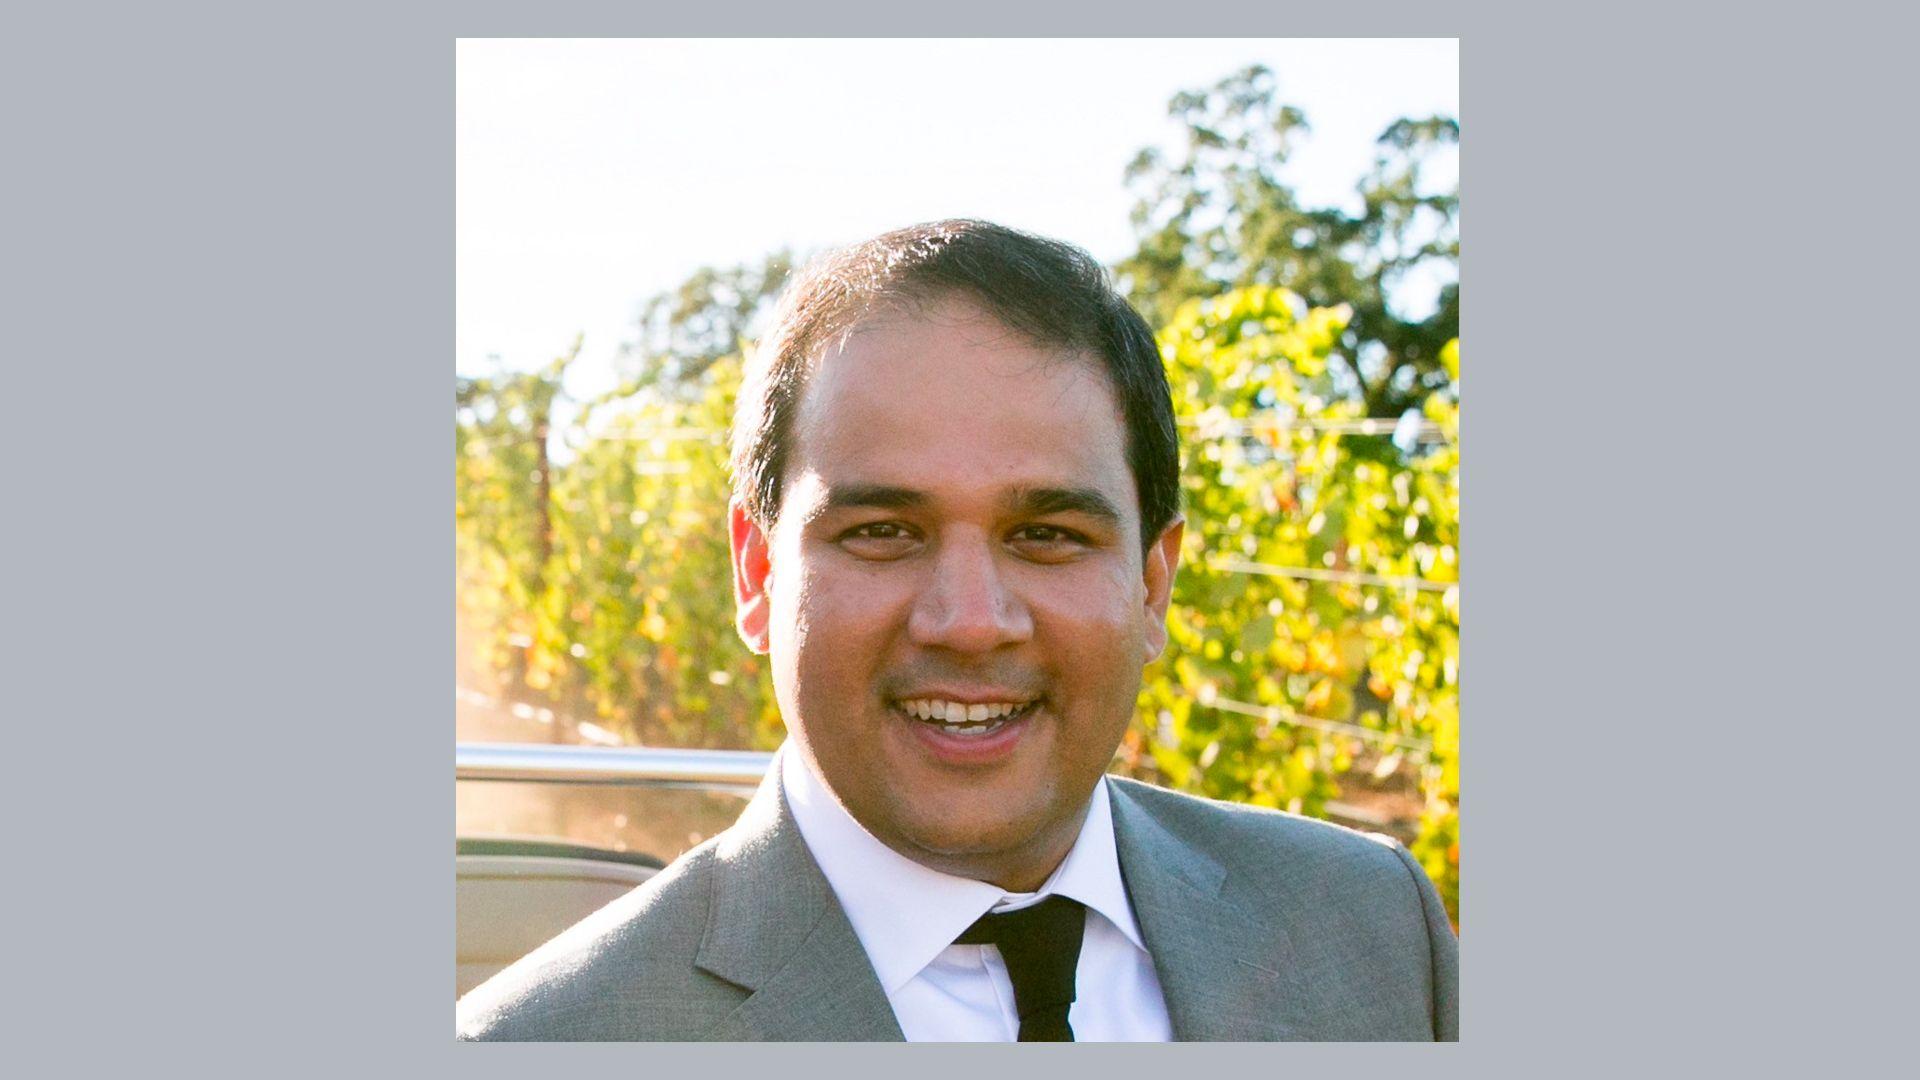 DoorDash snares Uber's finance chief, Prabir Adarkar - Axios